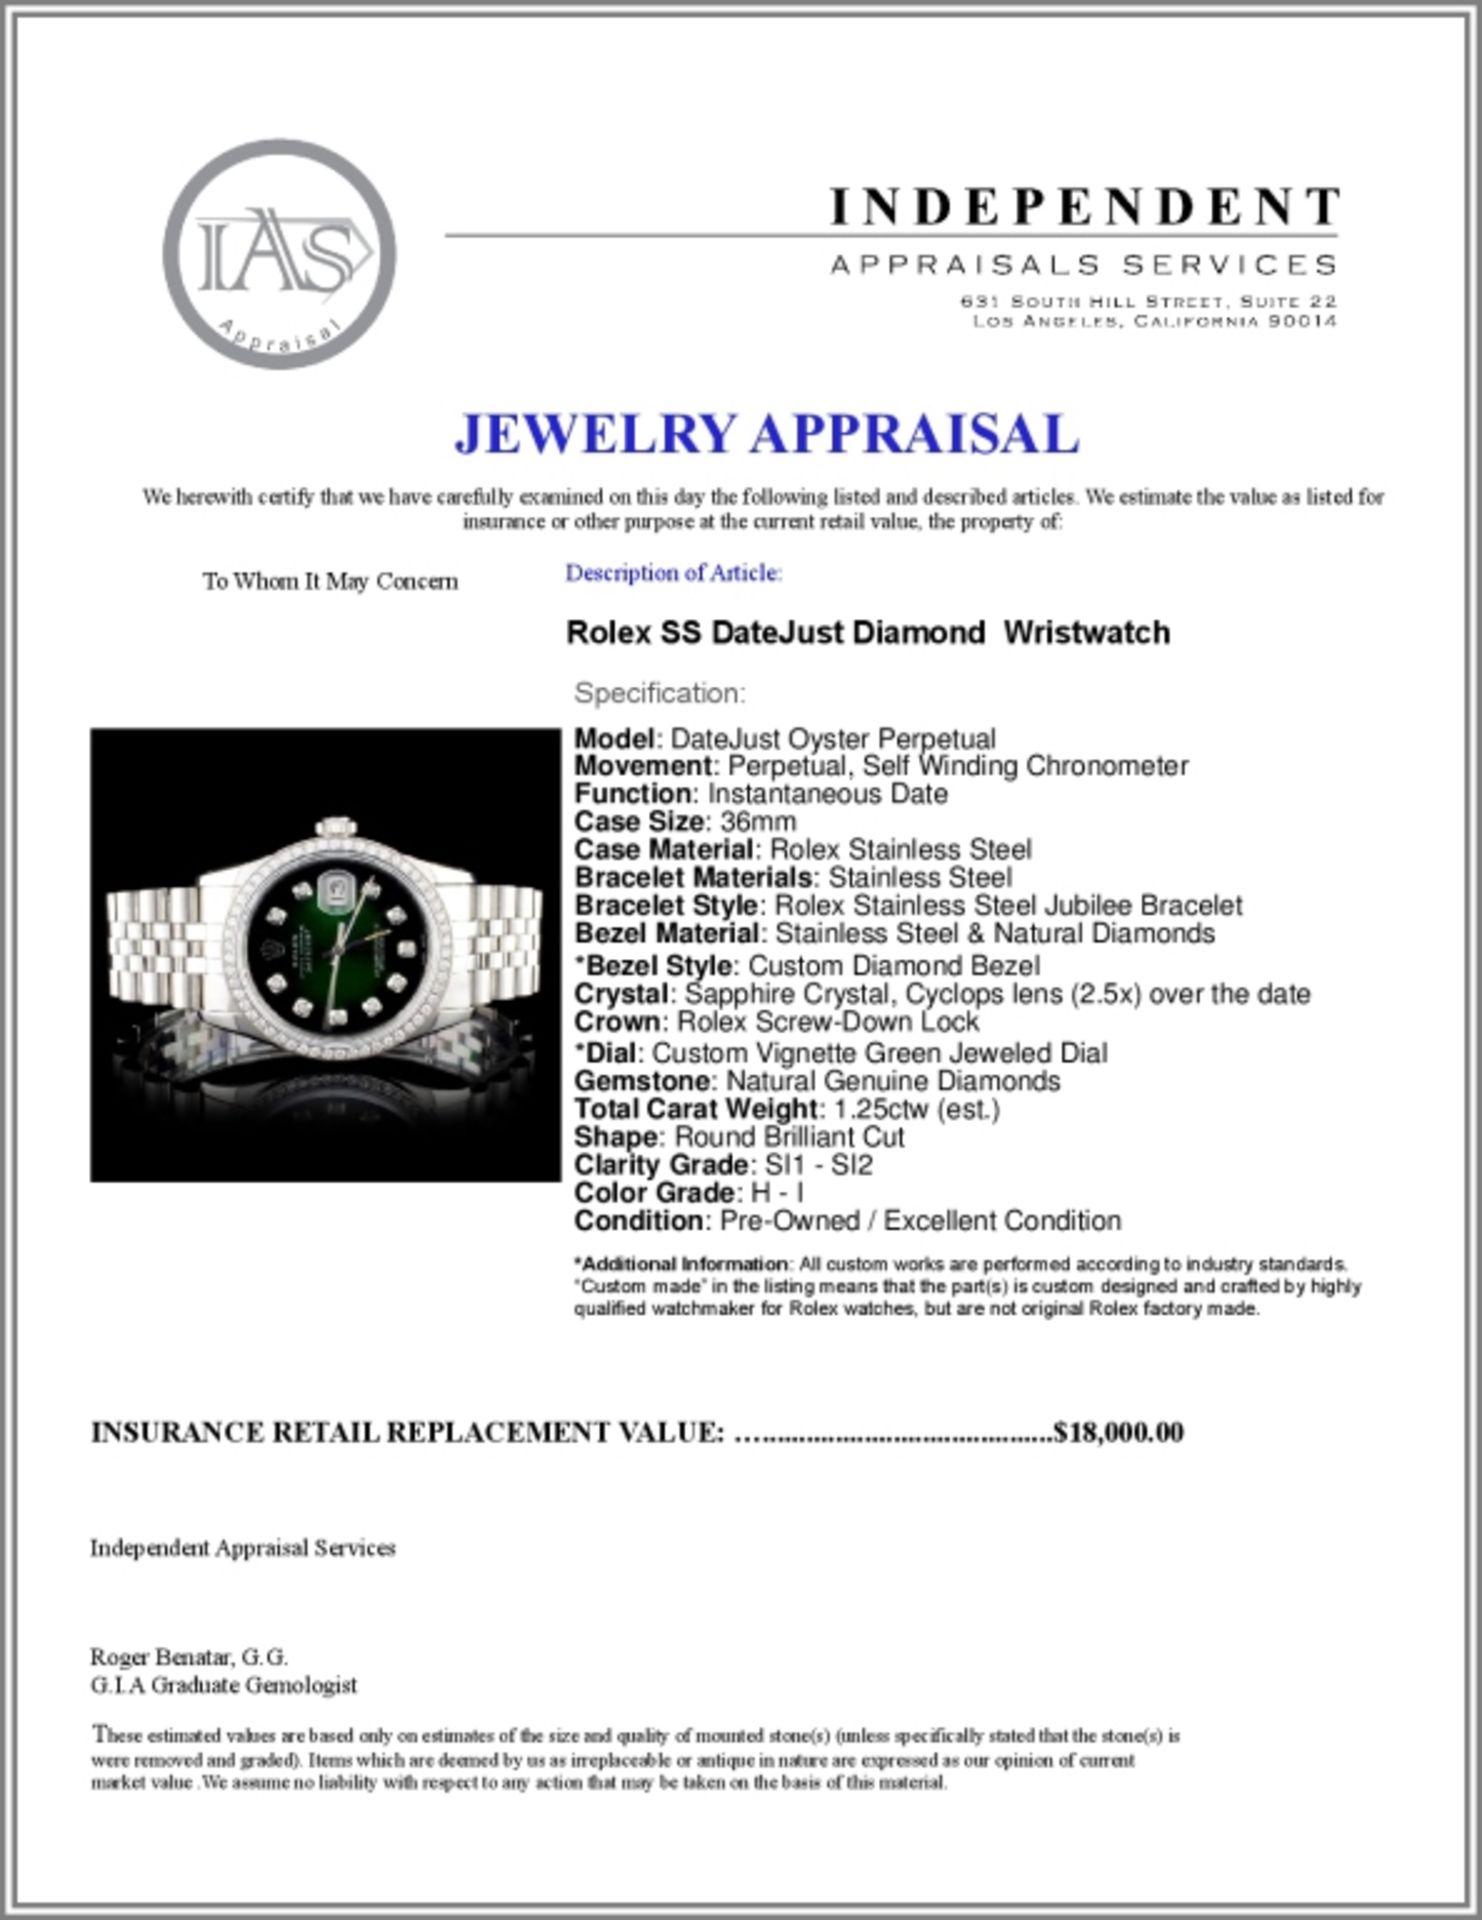 Rolex SS DateJust Diamond 36mm Wristwatch - Image 5 of 5